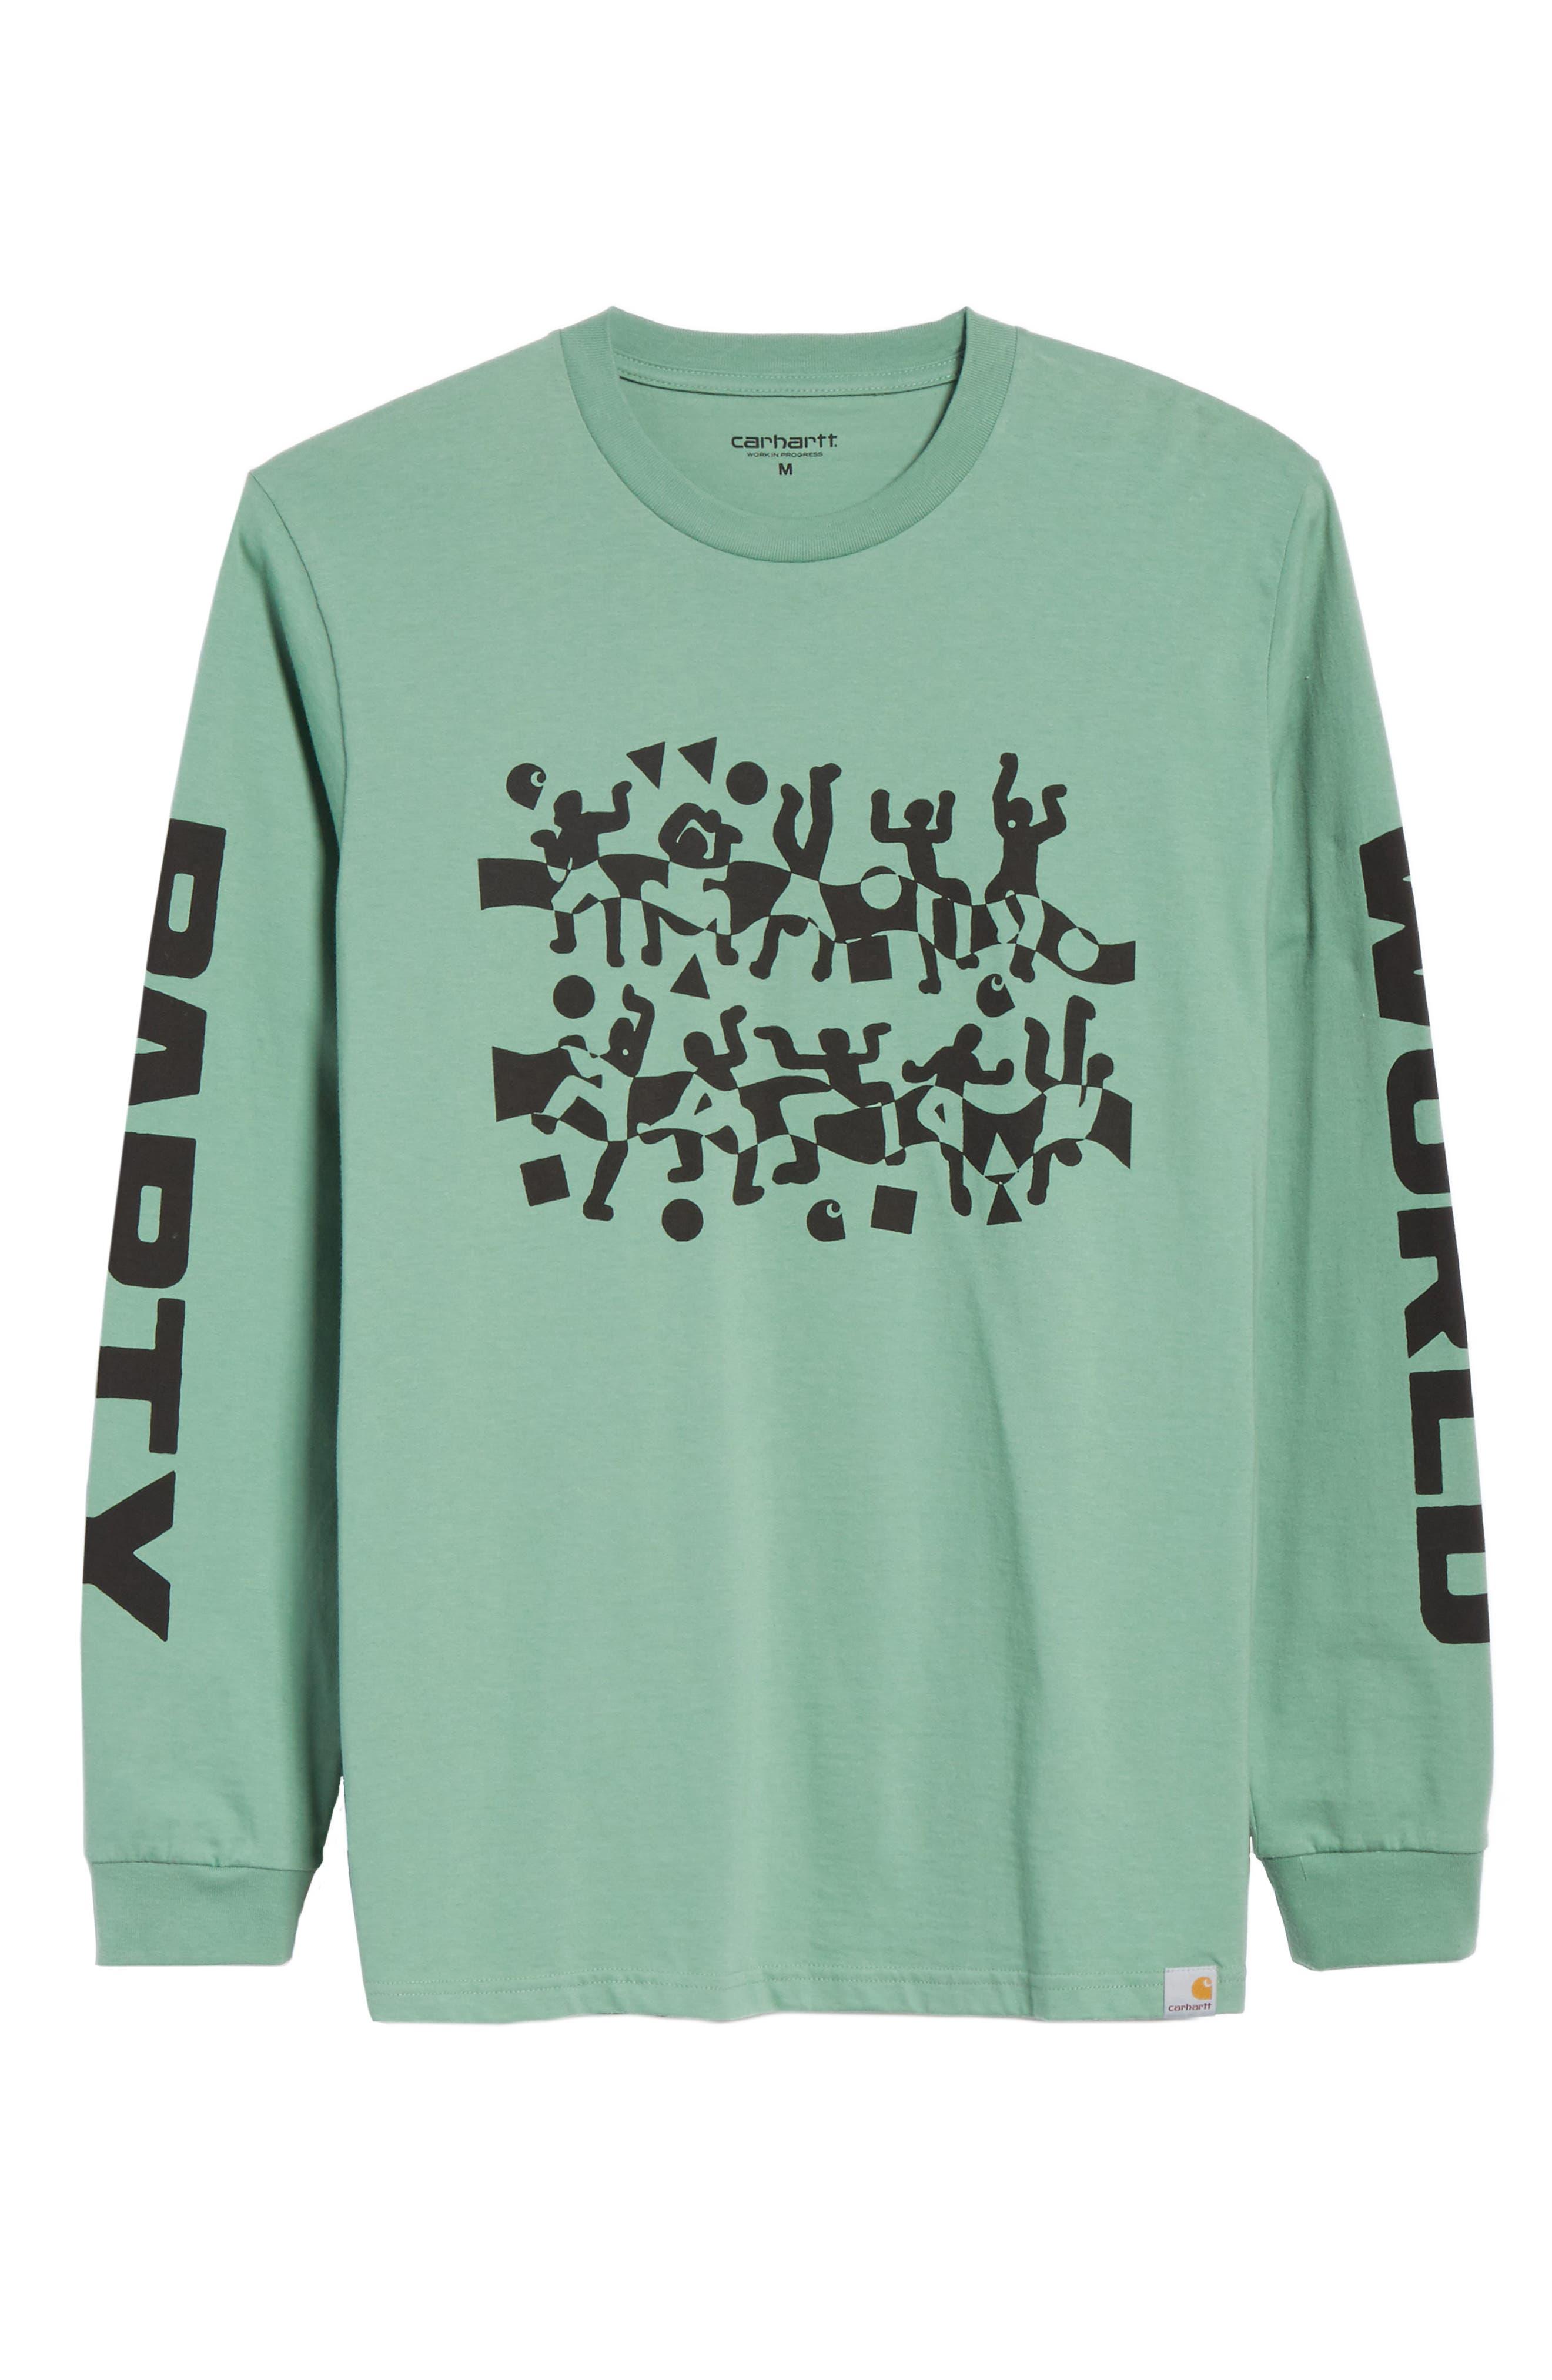 World Party T-Shirt,                             Alternate thumbnail 6, color,                             Catnip/Black